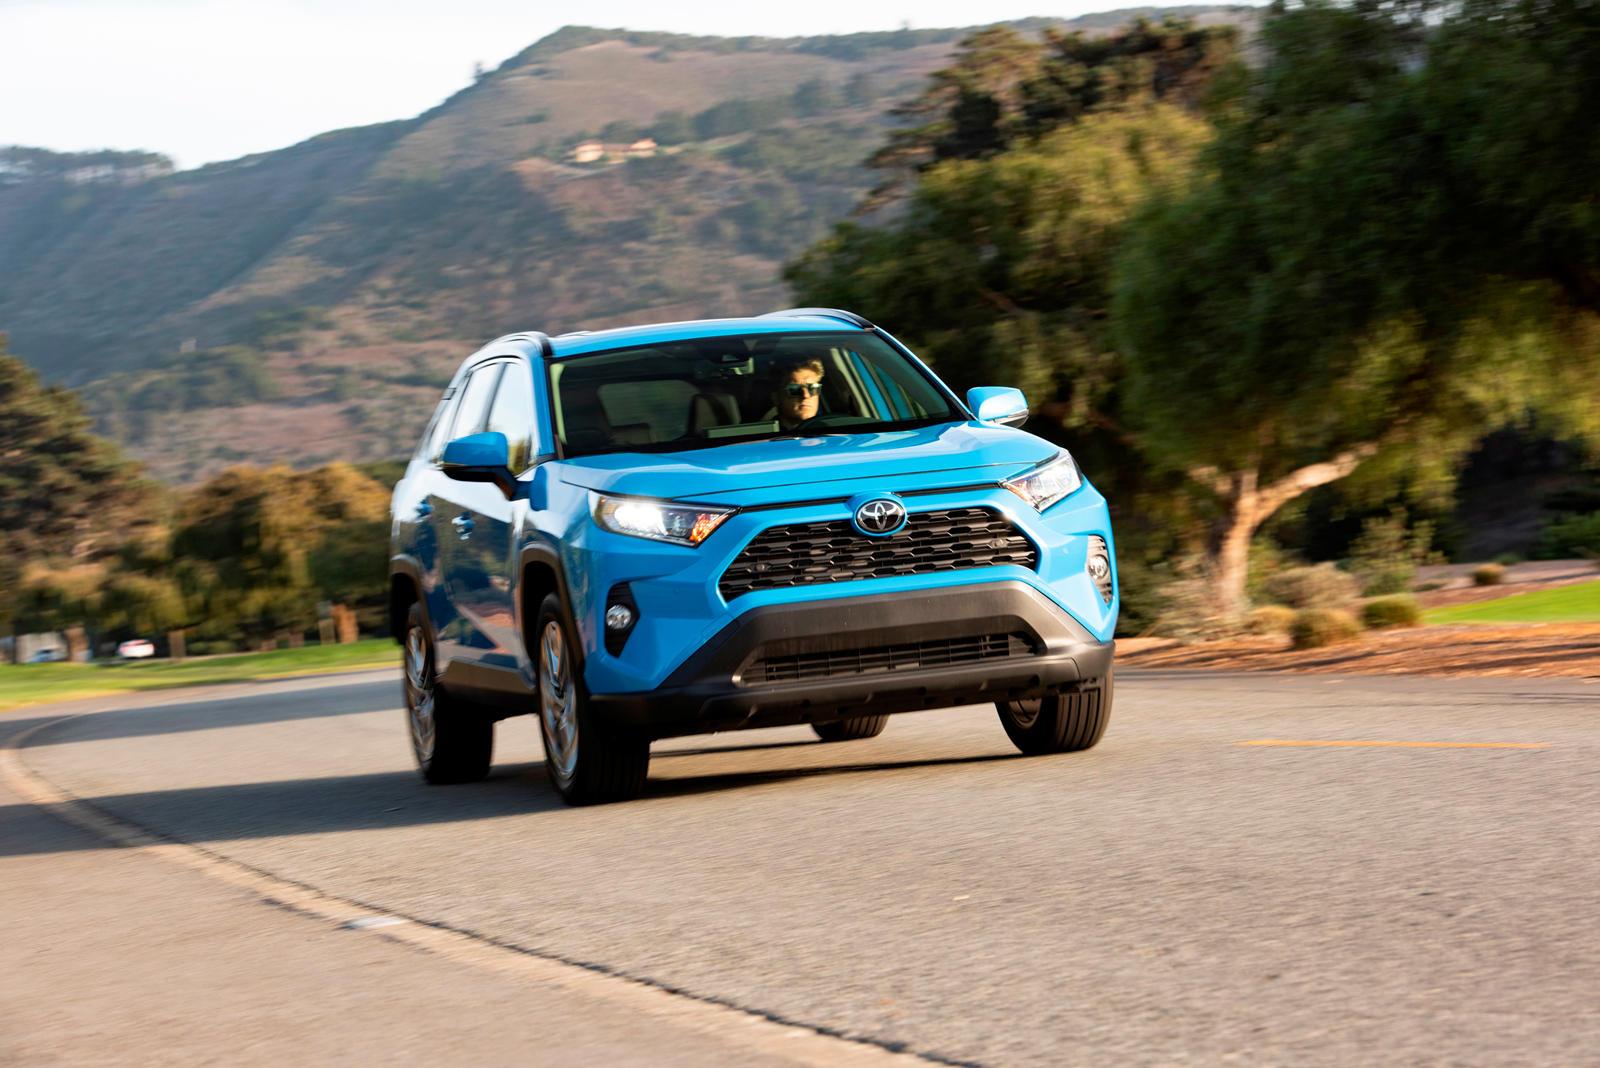 2134 2019 Toyota RAV4 First Drive Review: Hybrid Shines, Gas Model Stumbles